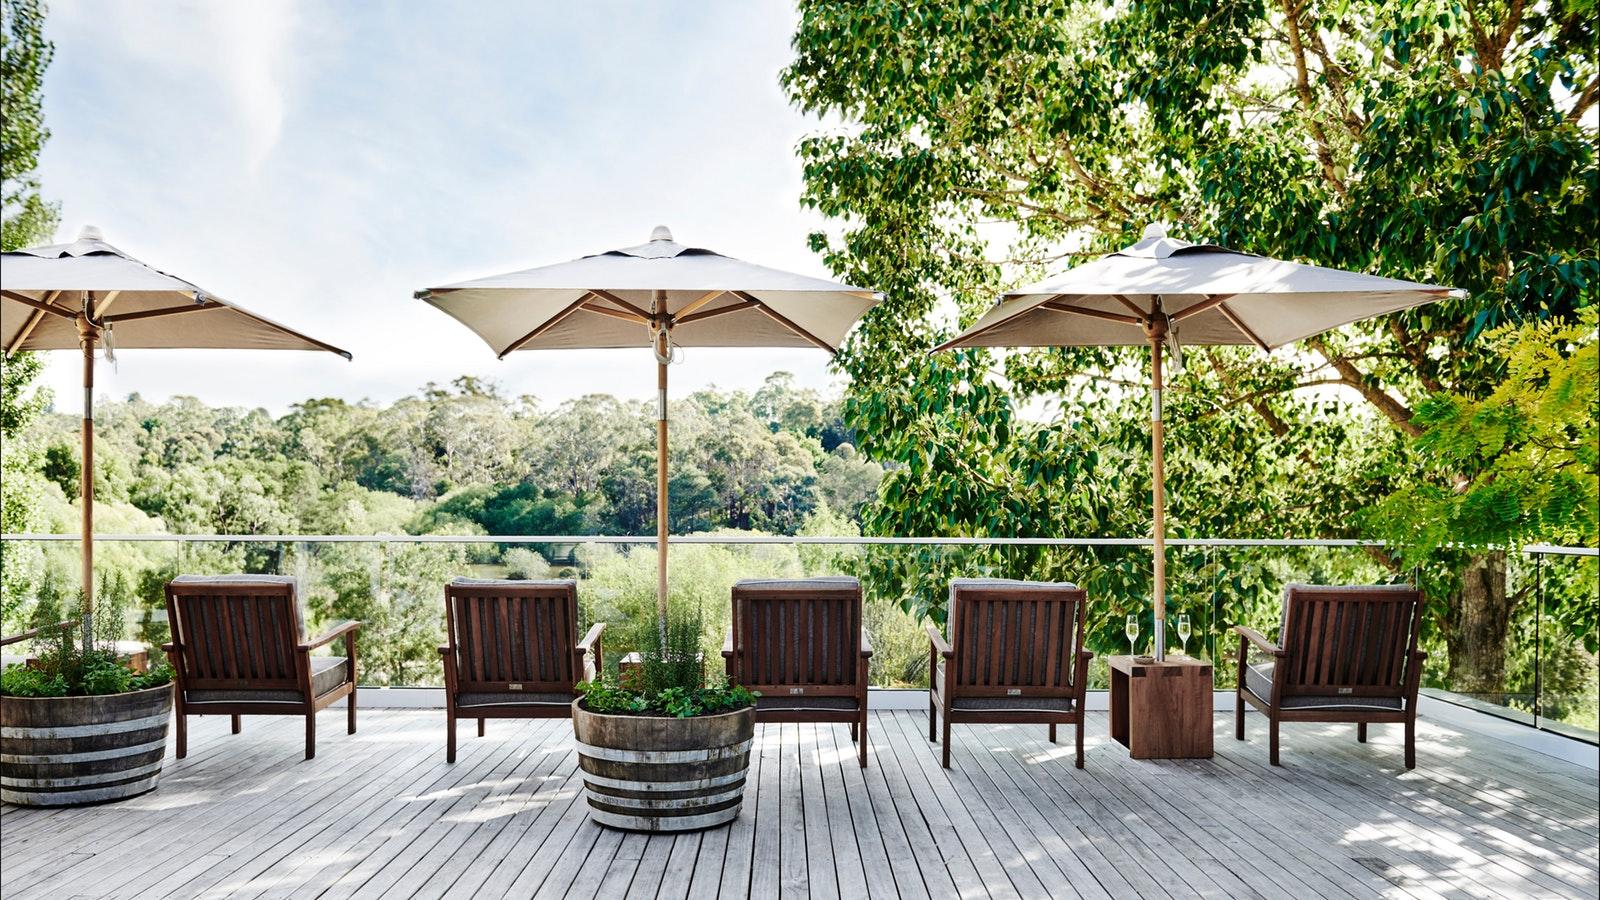 The Restaurant Deck